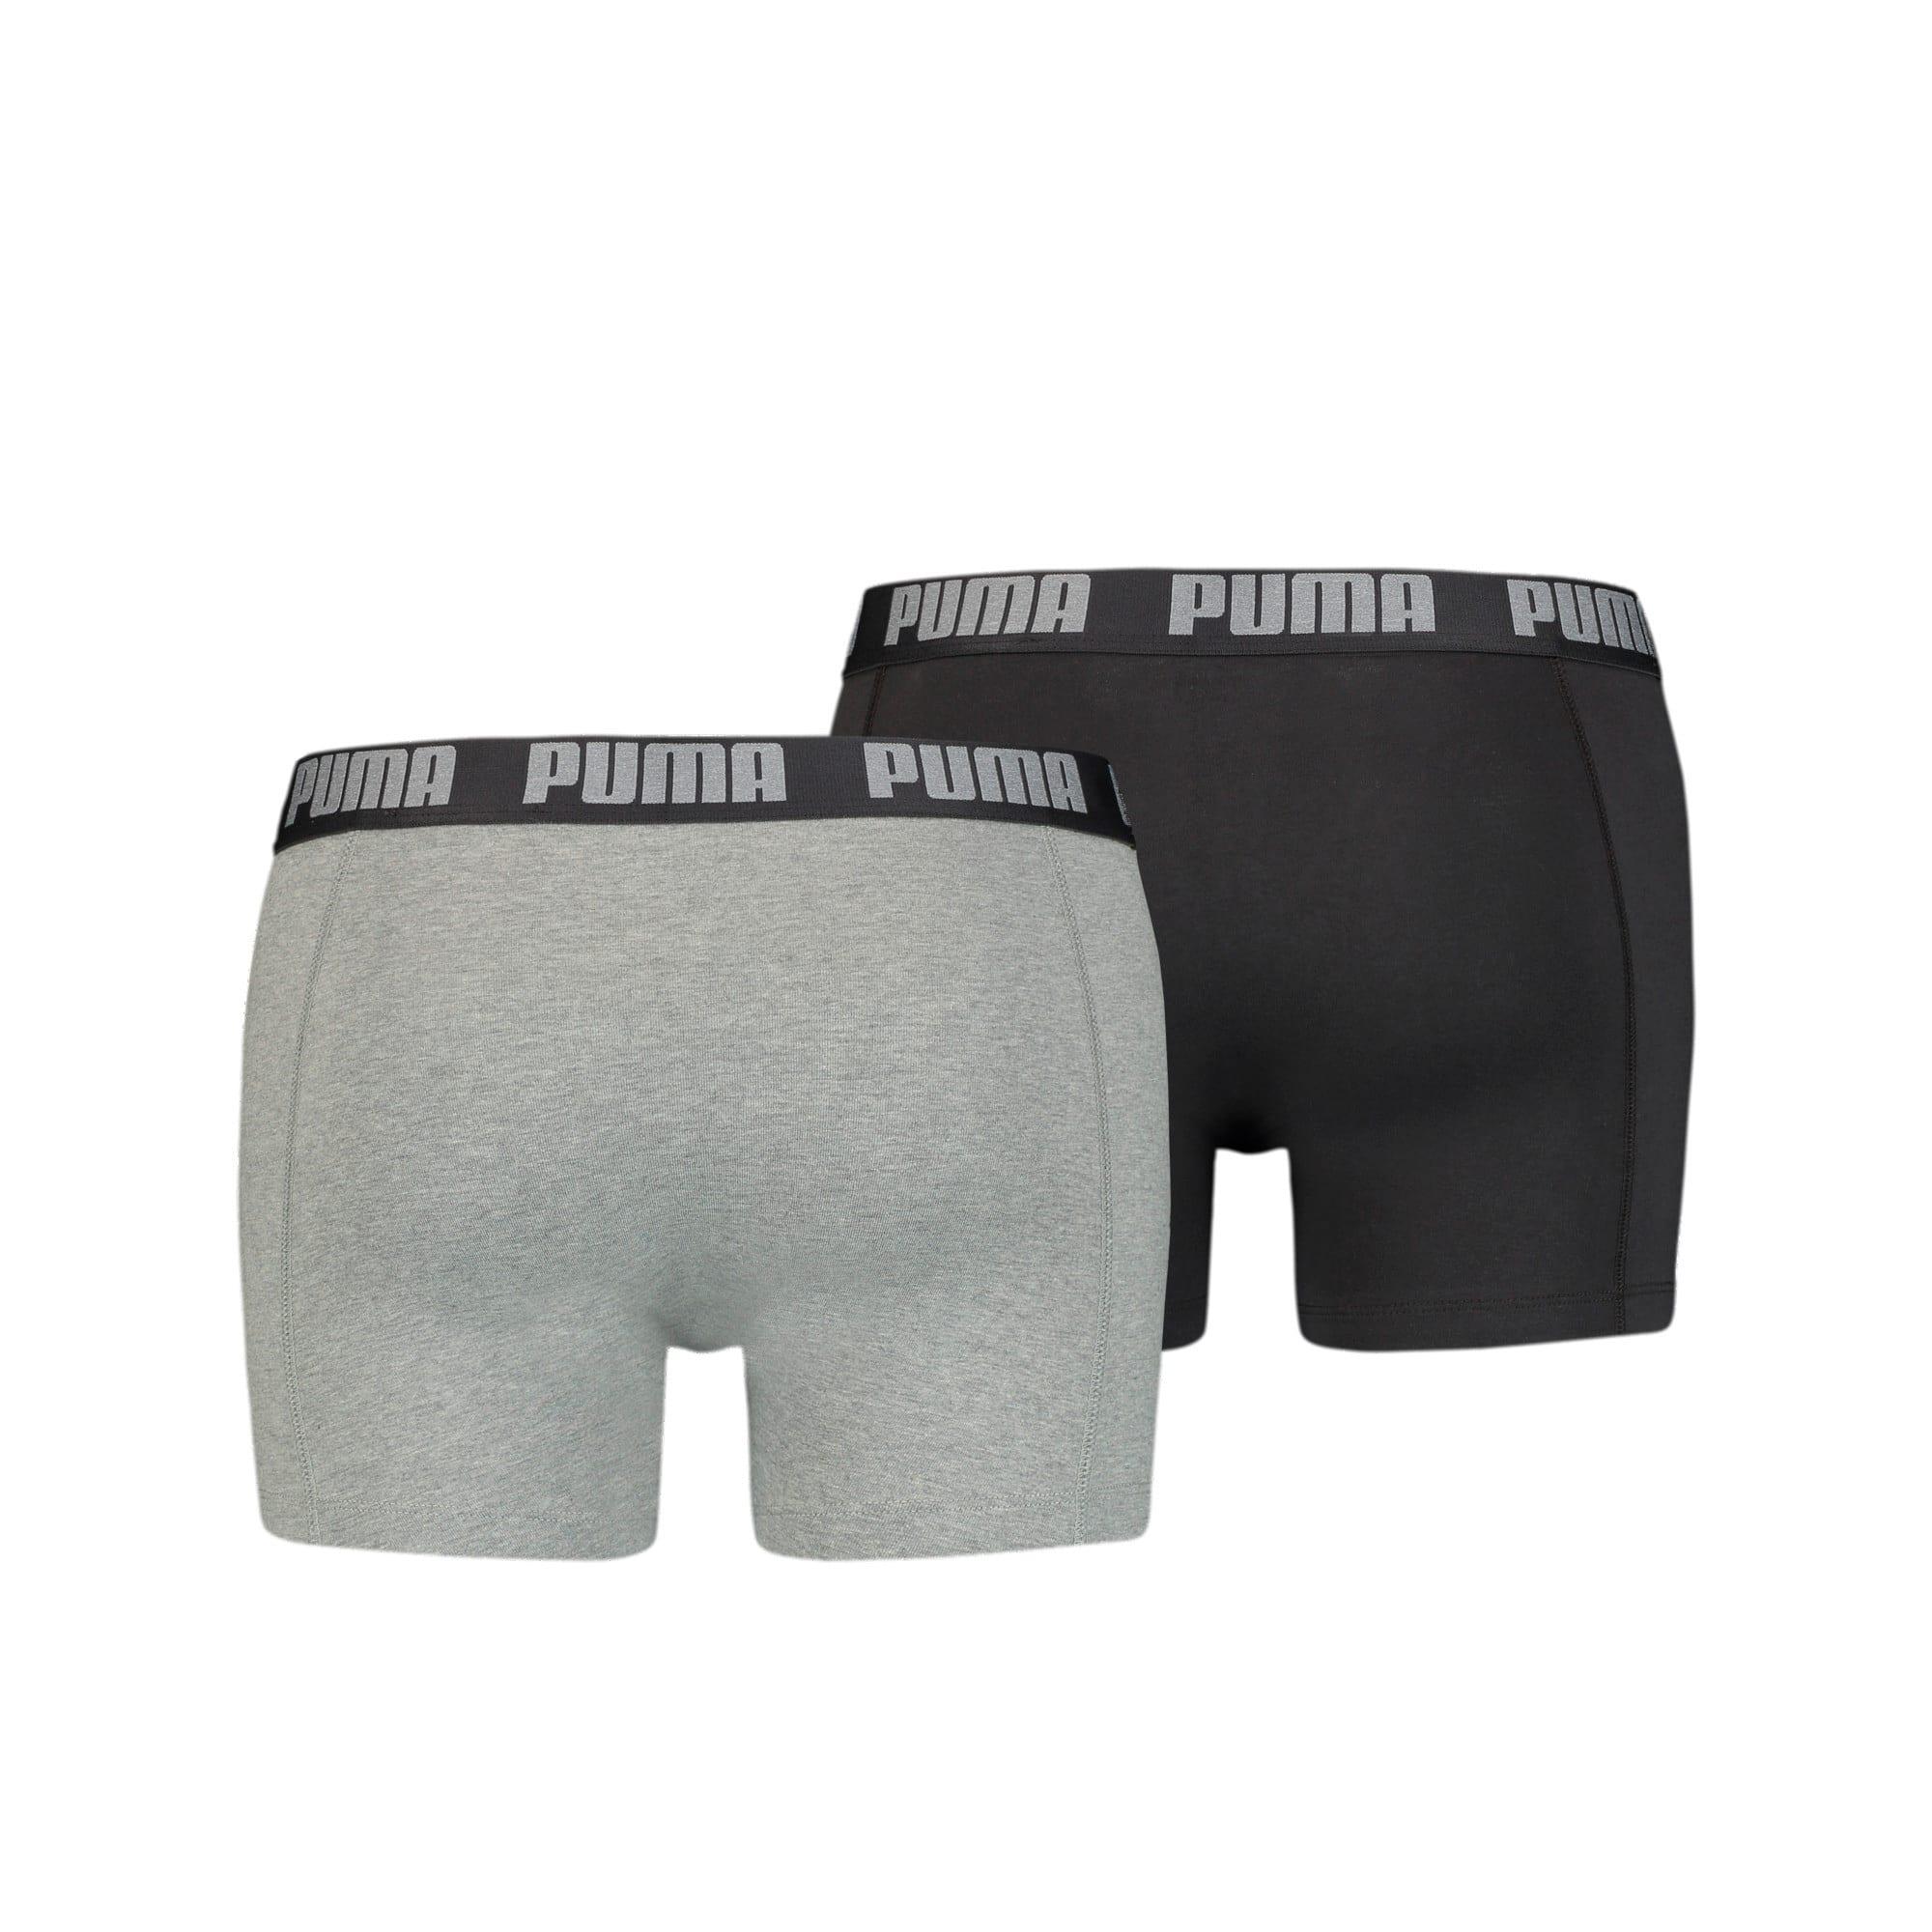 Thumbnail 5 of Men's Basic Boxer Shorts 2 Pack, dark grey melange / black, medium